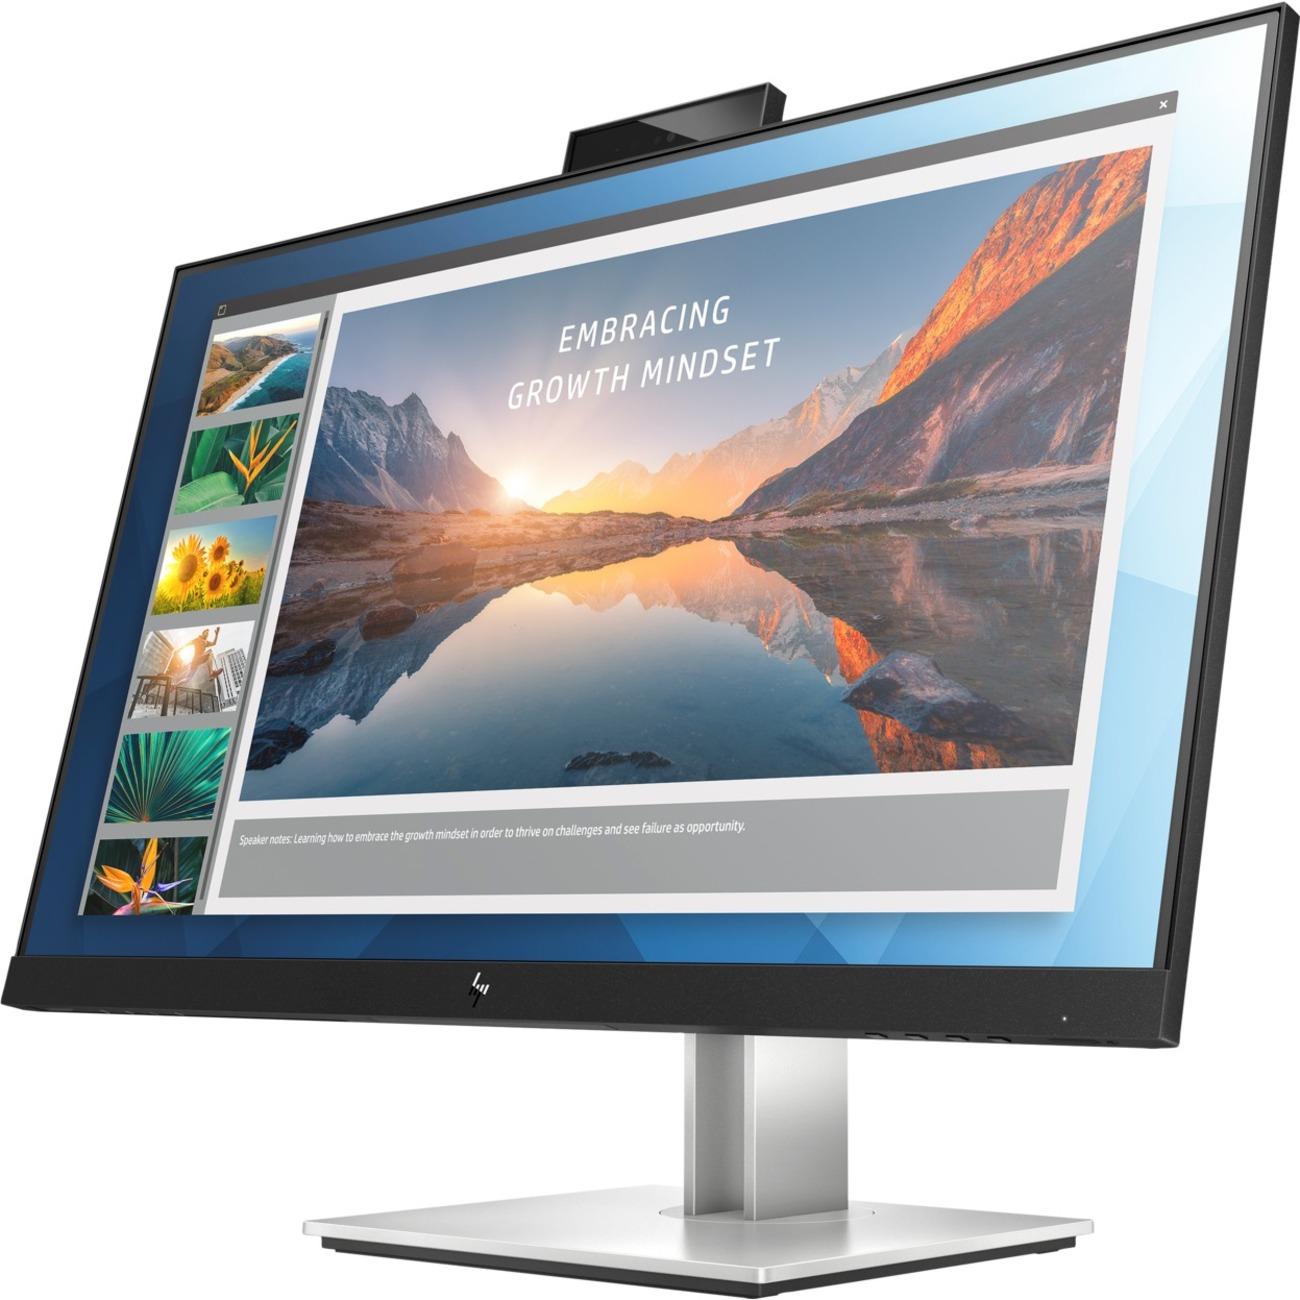 "HP E24d G4 23.8"" Full HD LED LCD Monitor - 16:9 - Black, Silver_subImage_1"